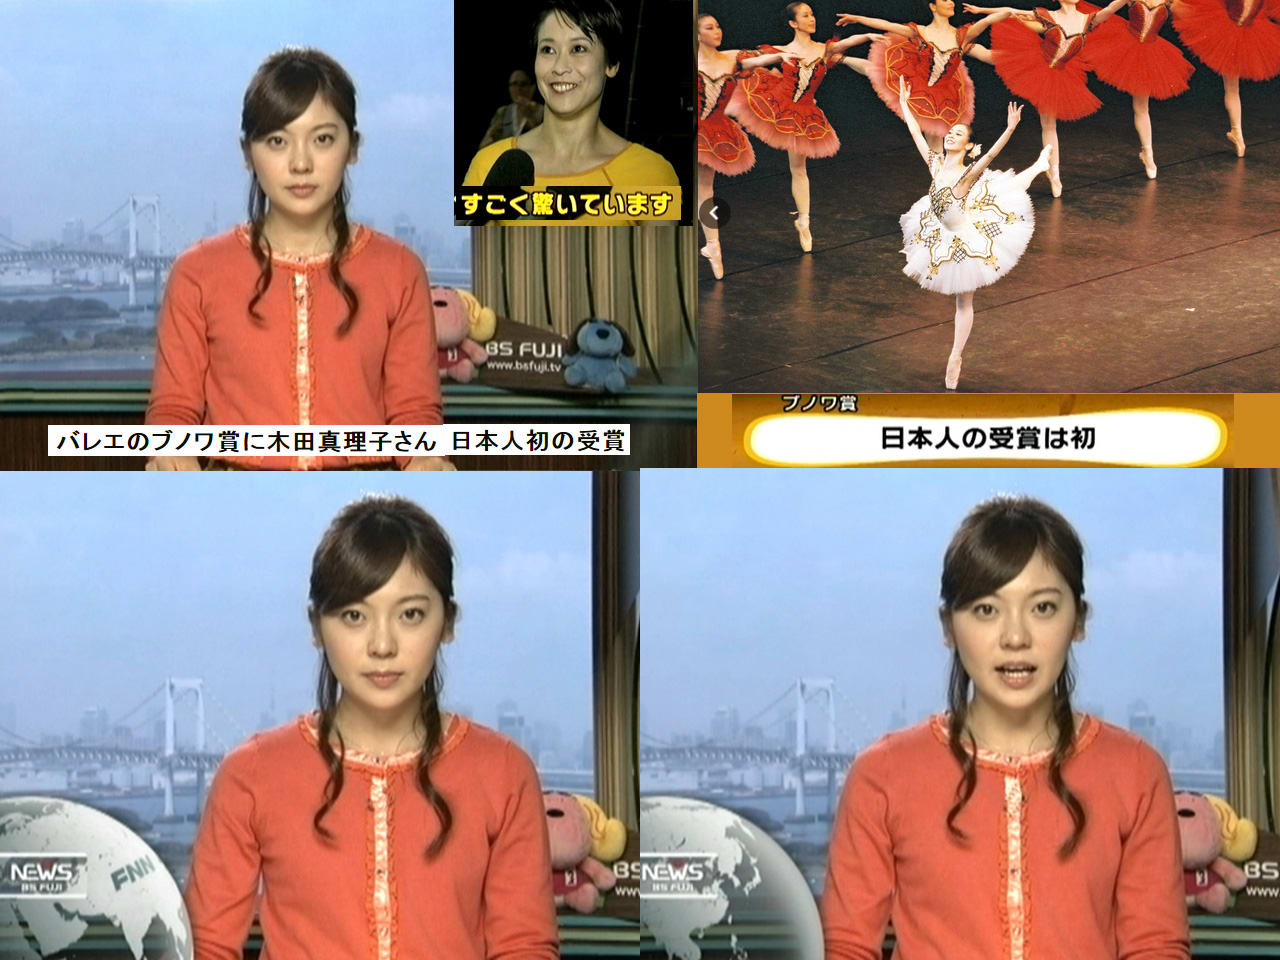 森夏美 (1995年生)の画像 p1_14